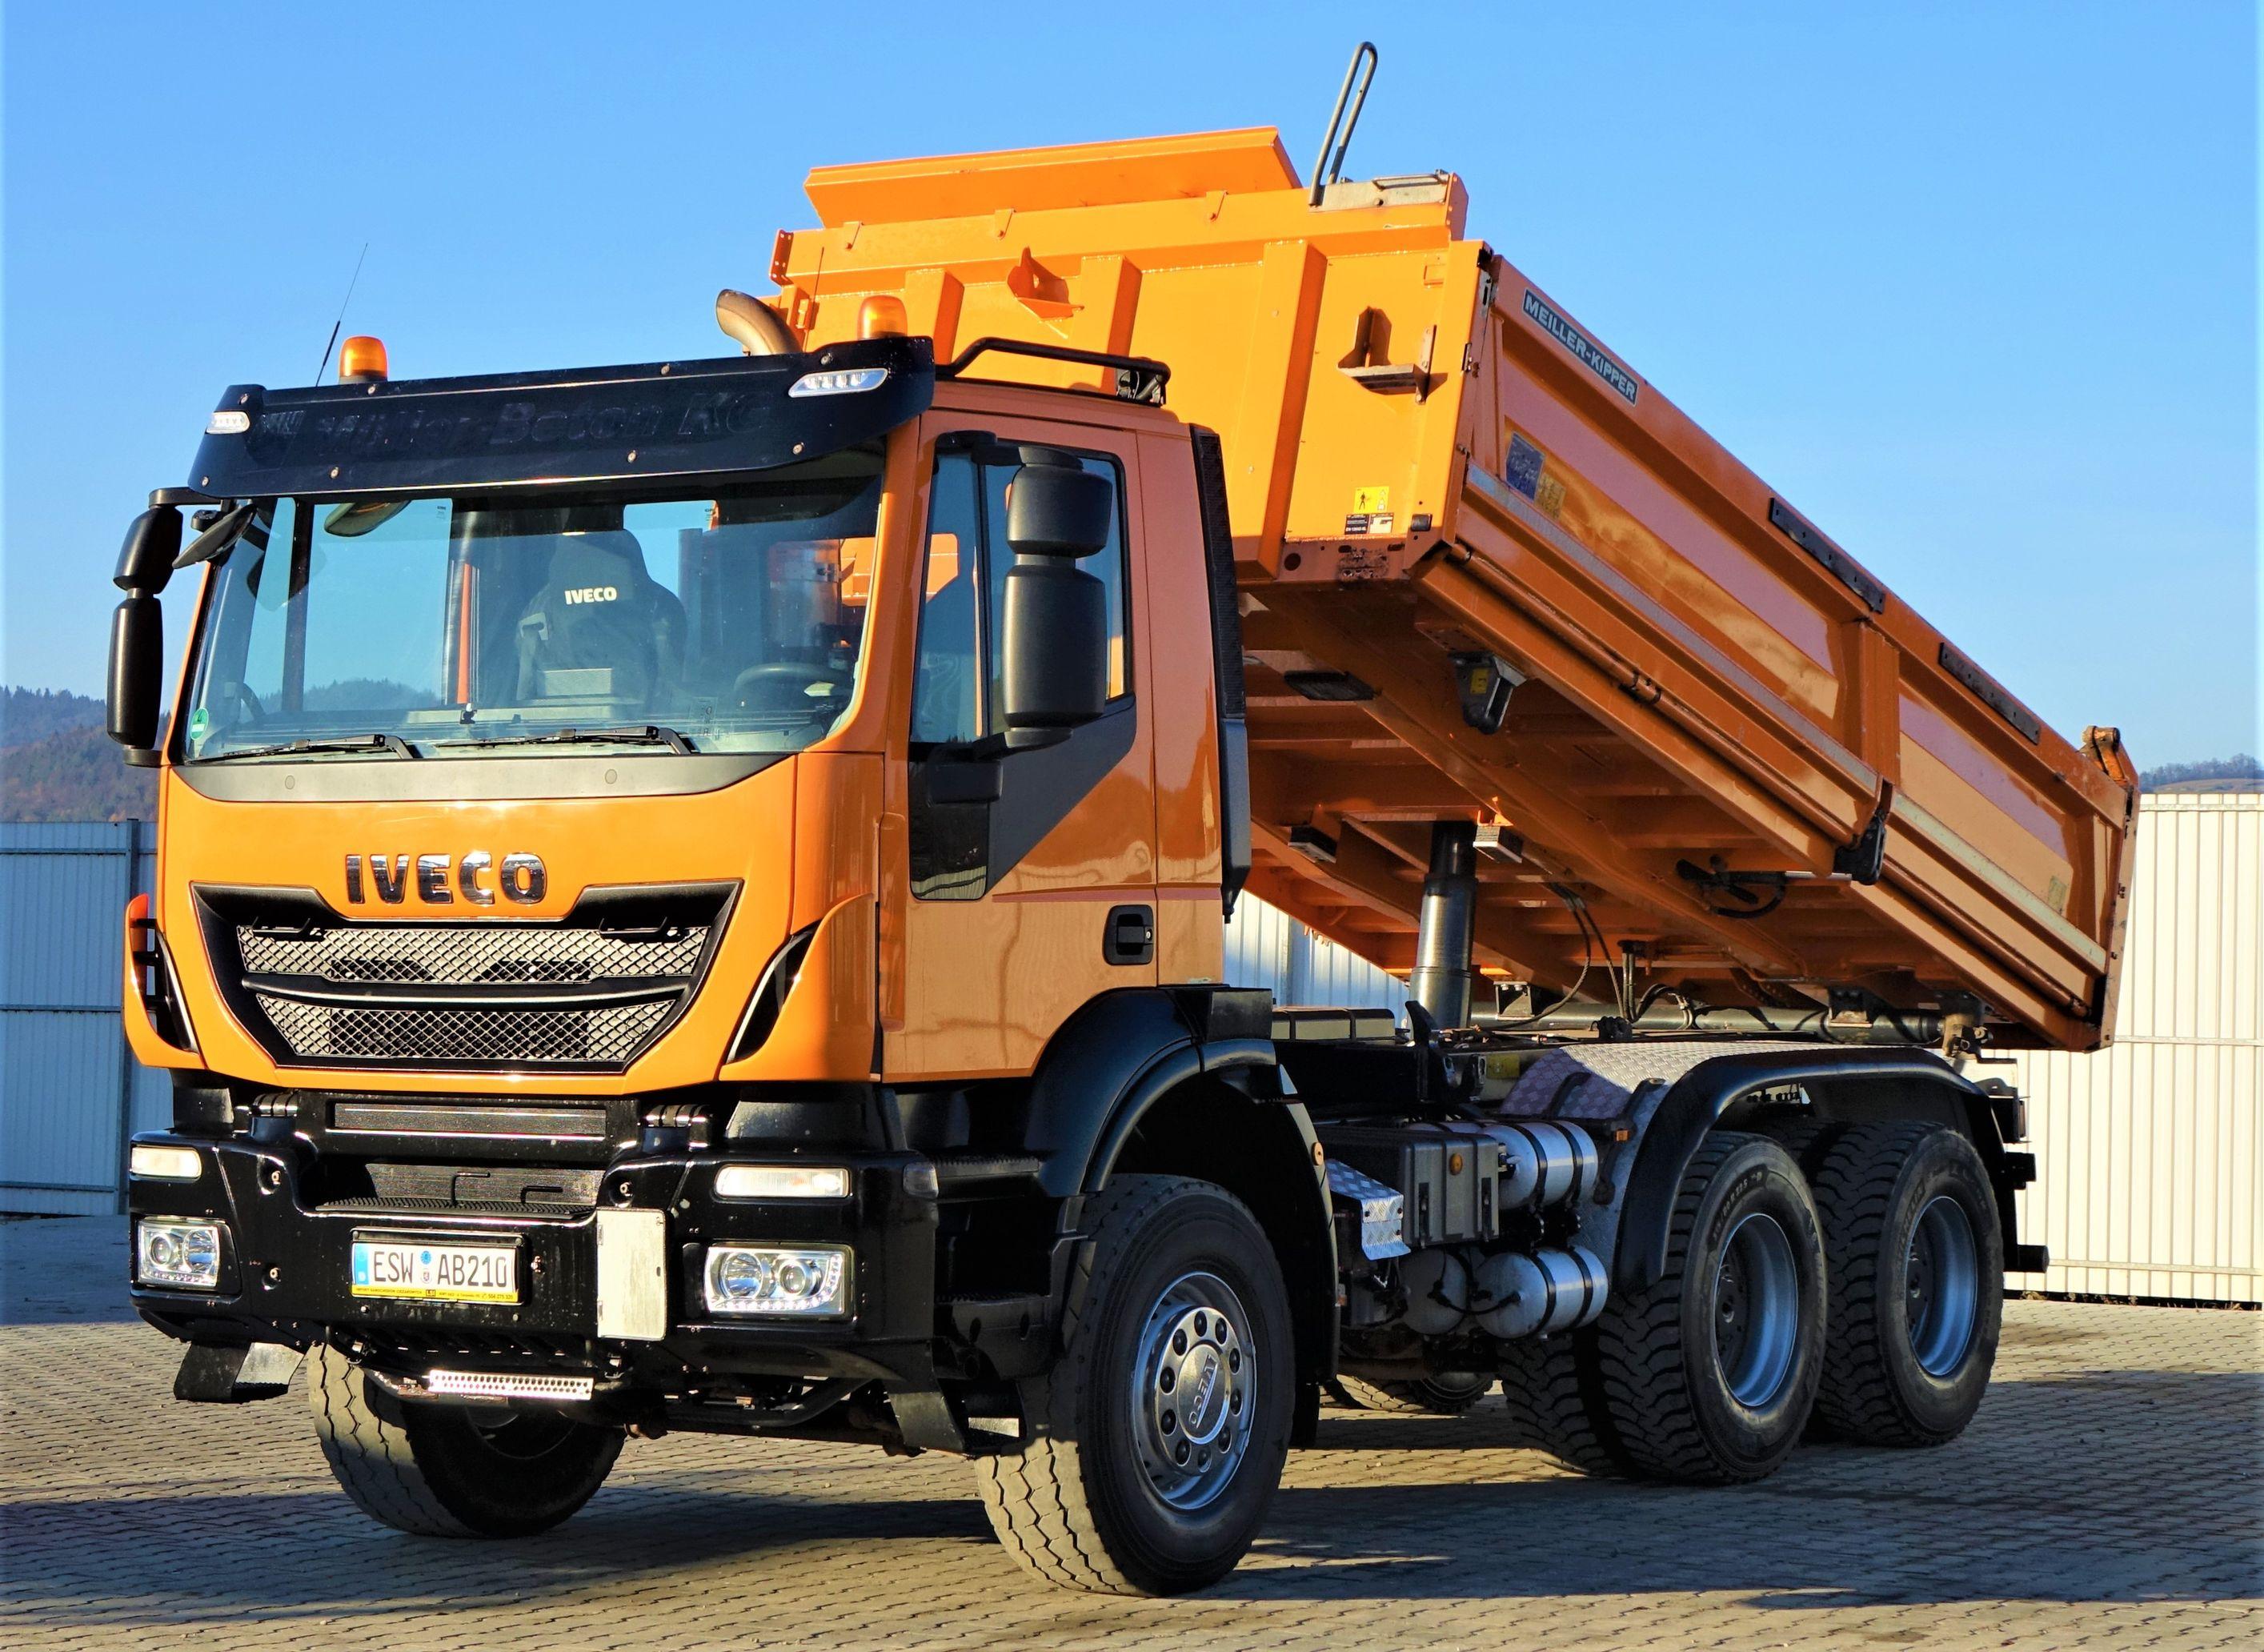 2015-iveco-trakker-450-365250-equipment-cover-image